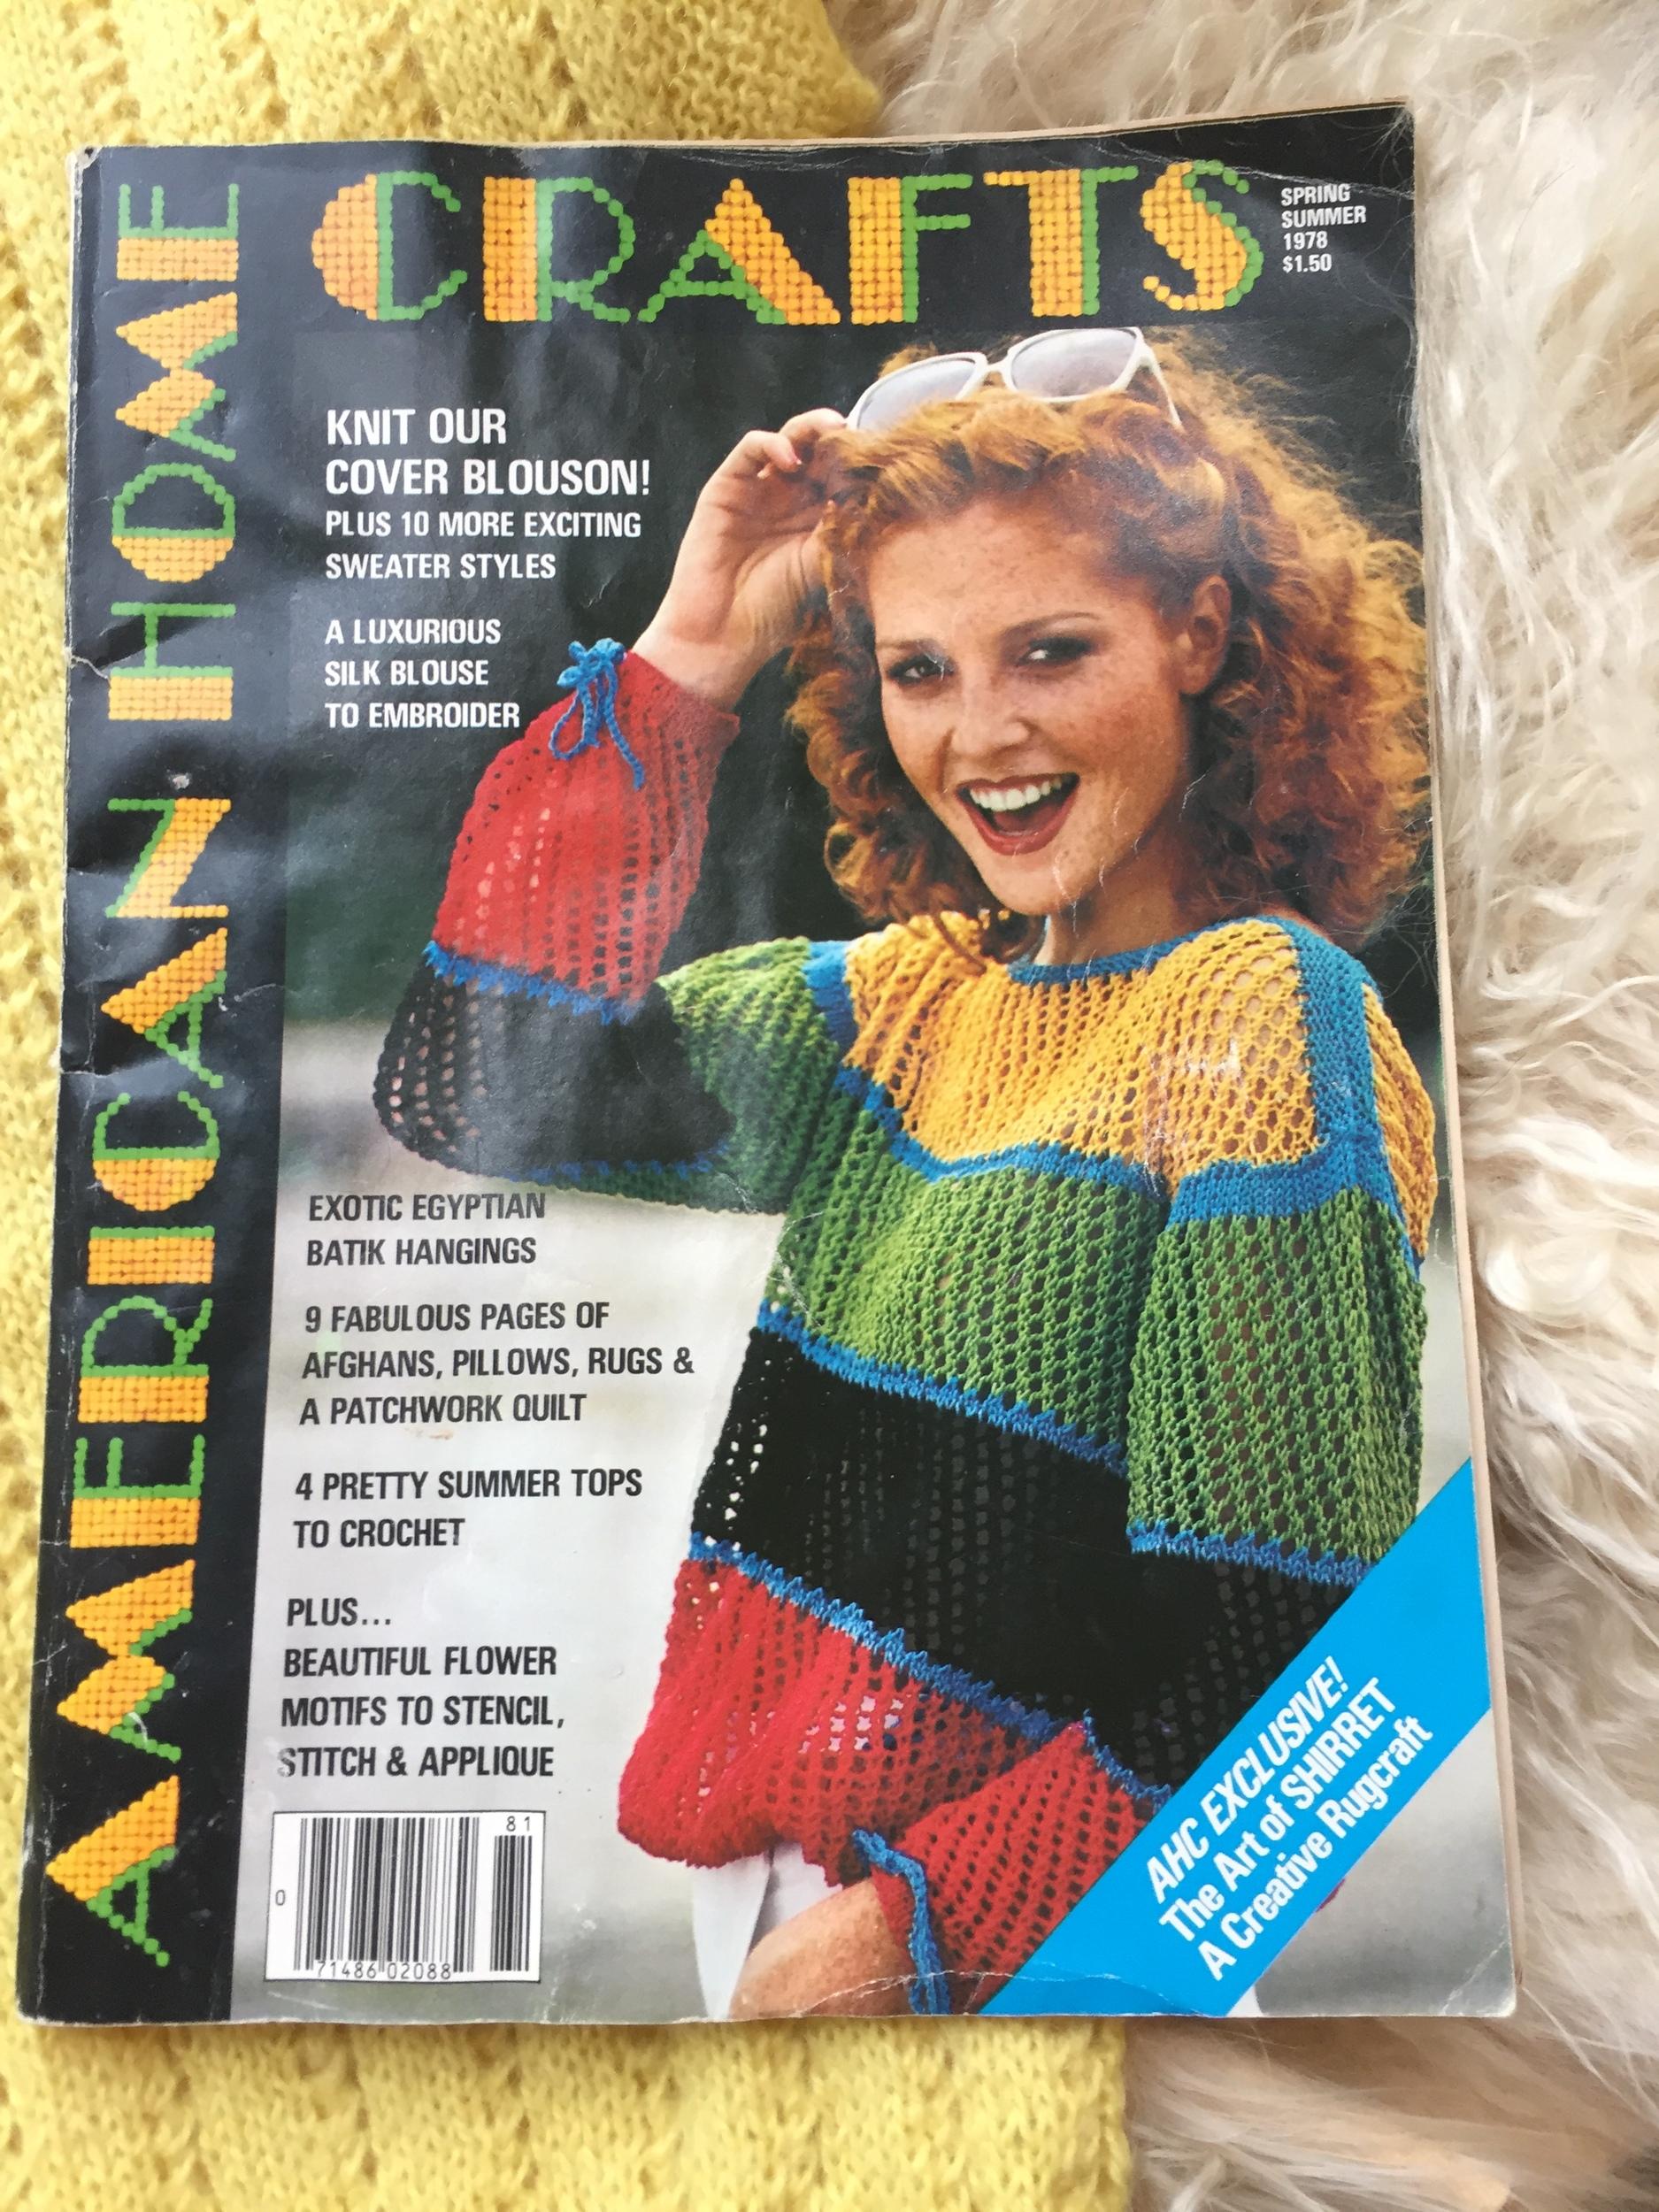 Lindsay_Yellow Sweater_4 of 6.jpg